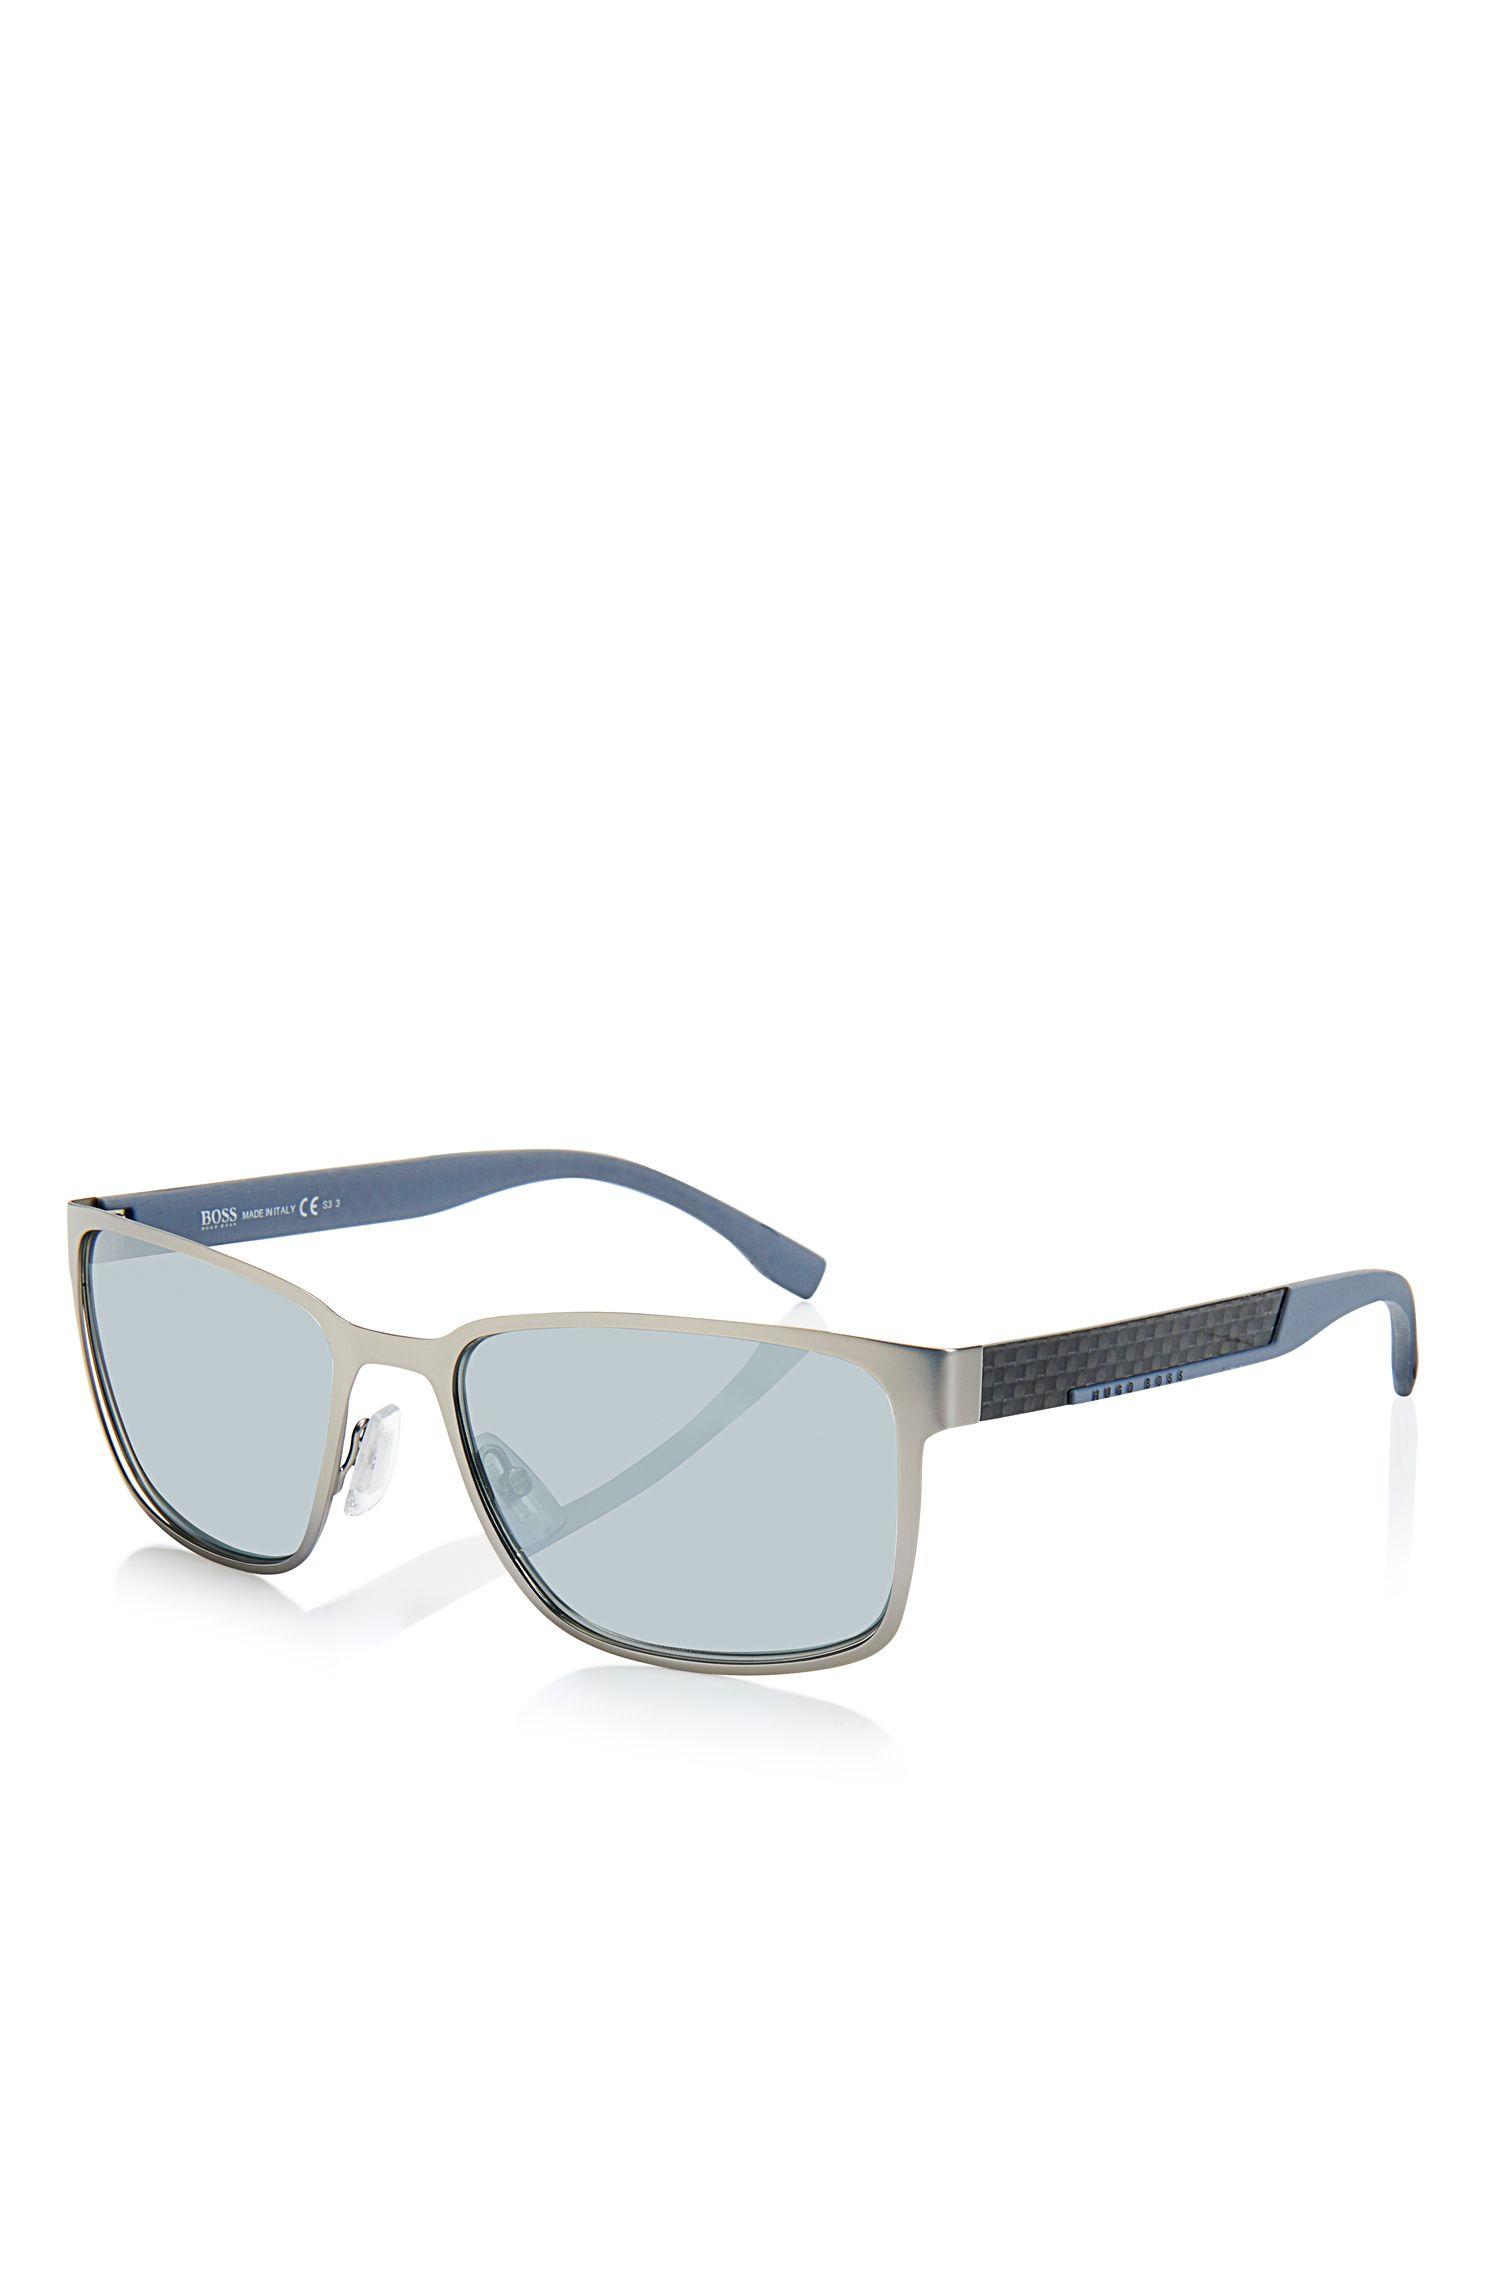 'Sunglasses'   Steel and Carbon Black Mirror Lens Sunglasses